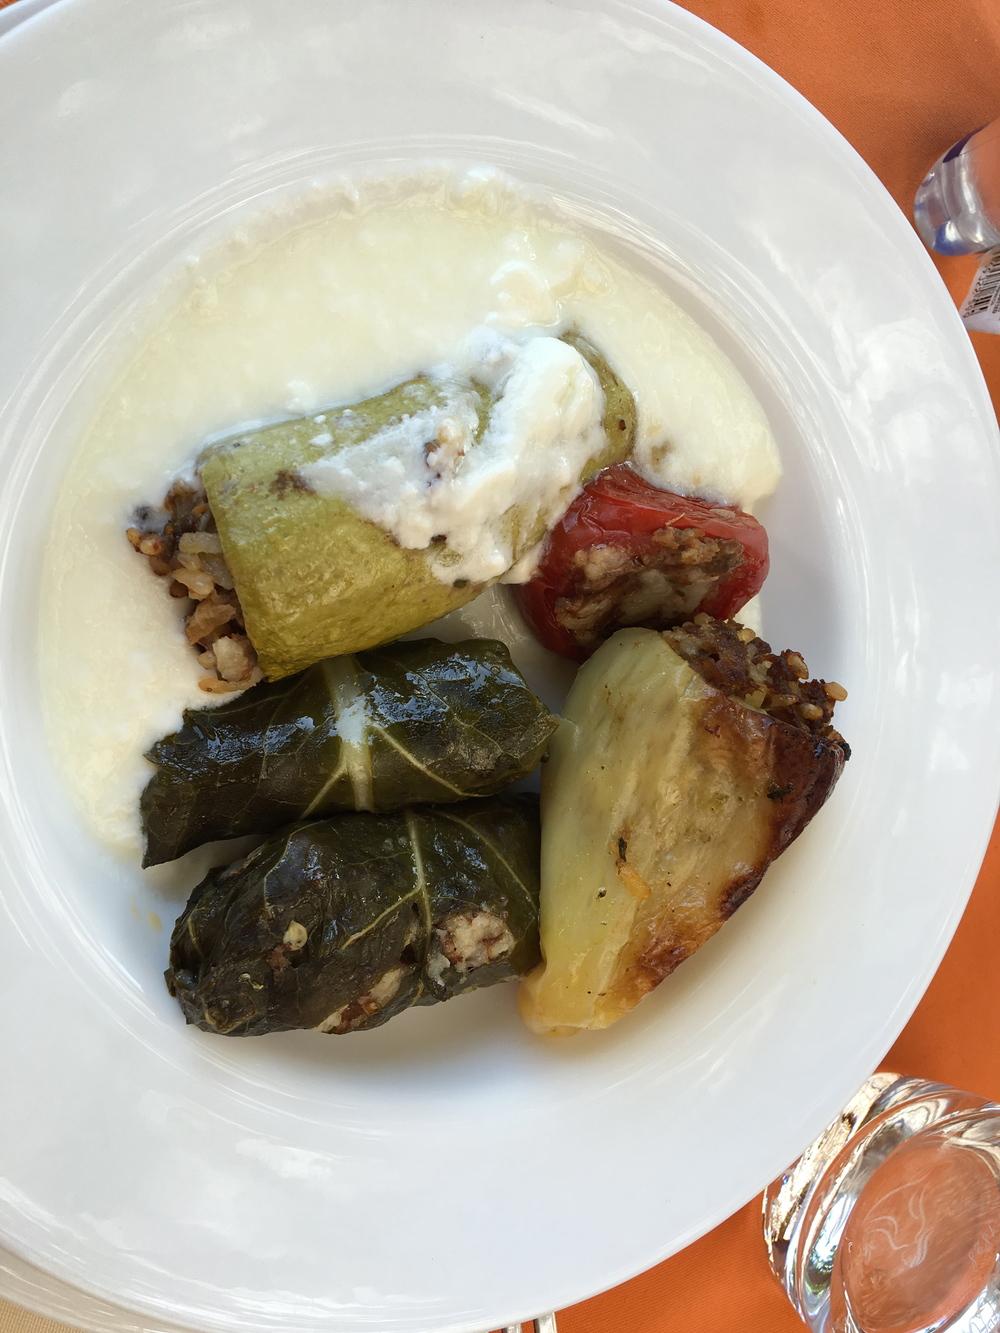 Bosnian specialties at Restoran Babilon